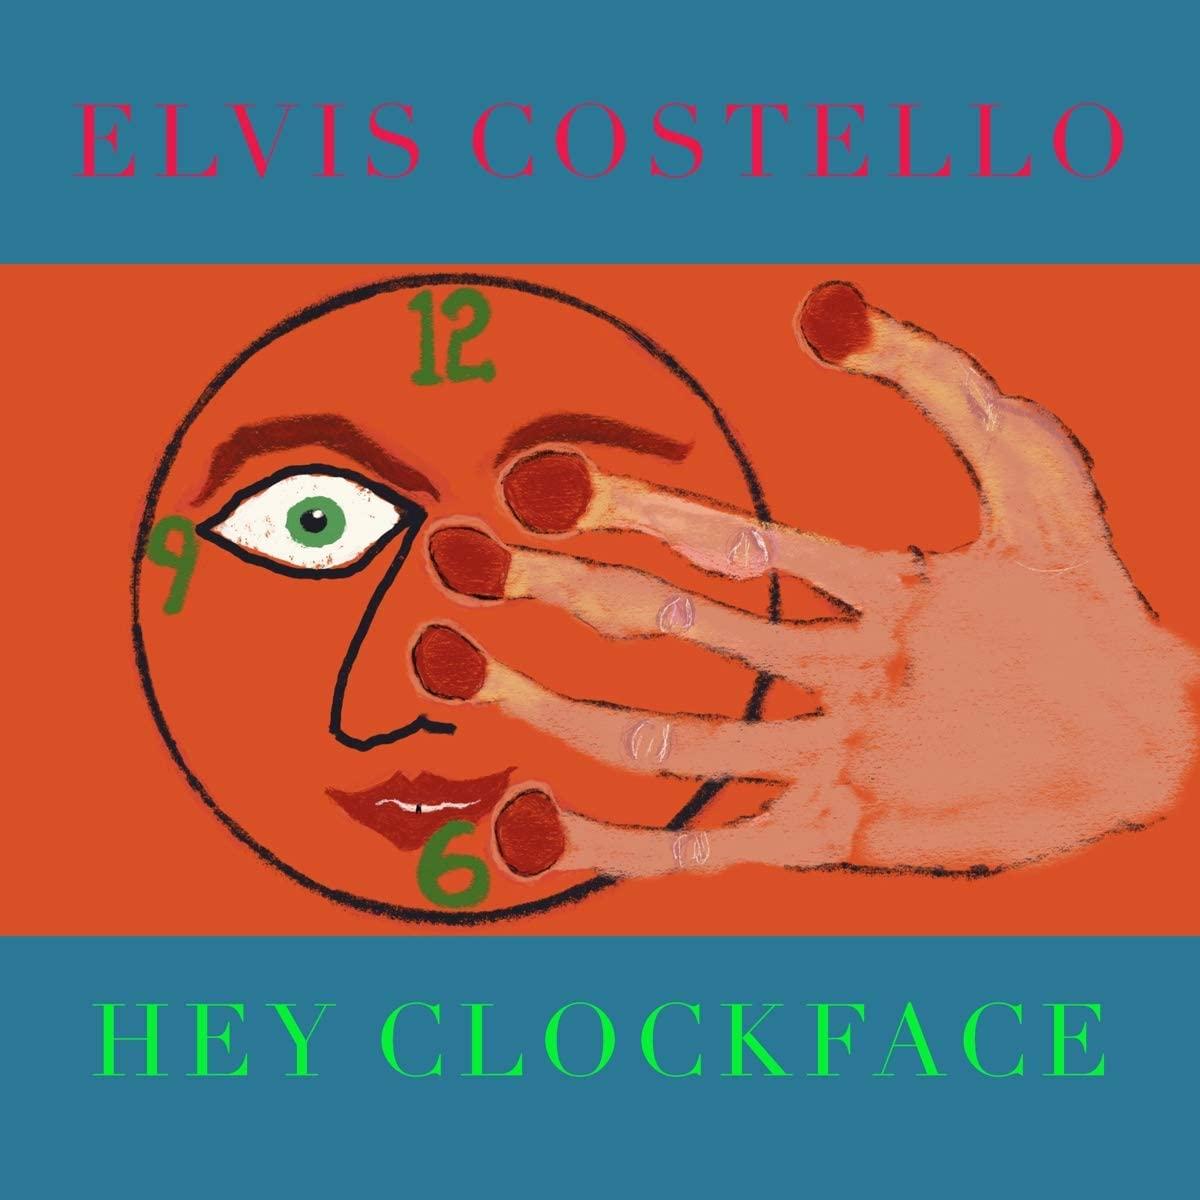 Elvis Costello - Hey Clockface [2xLP]